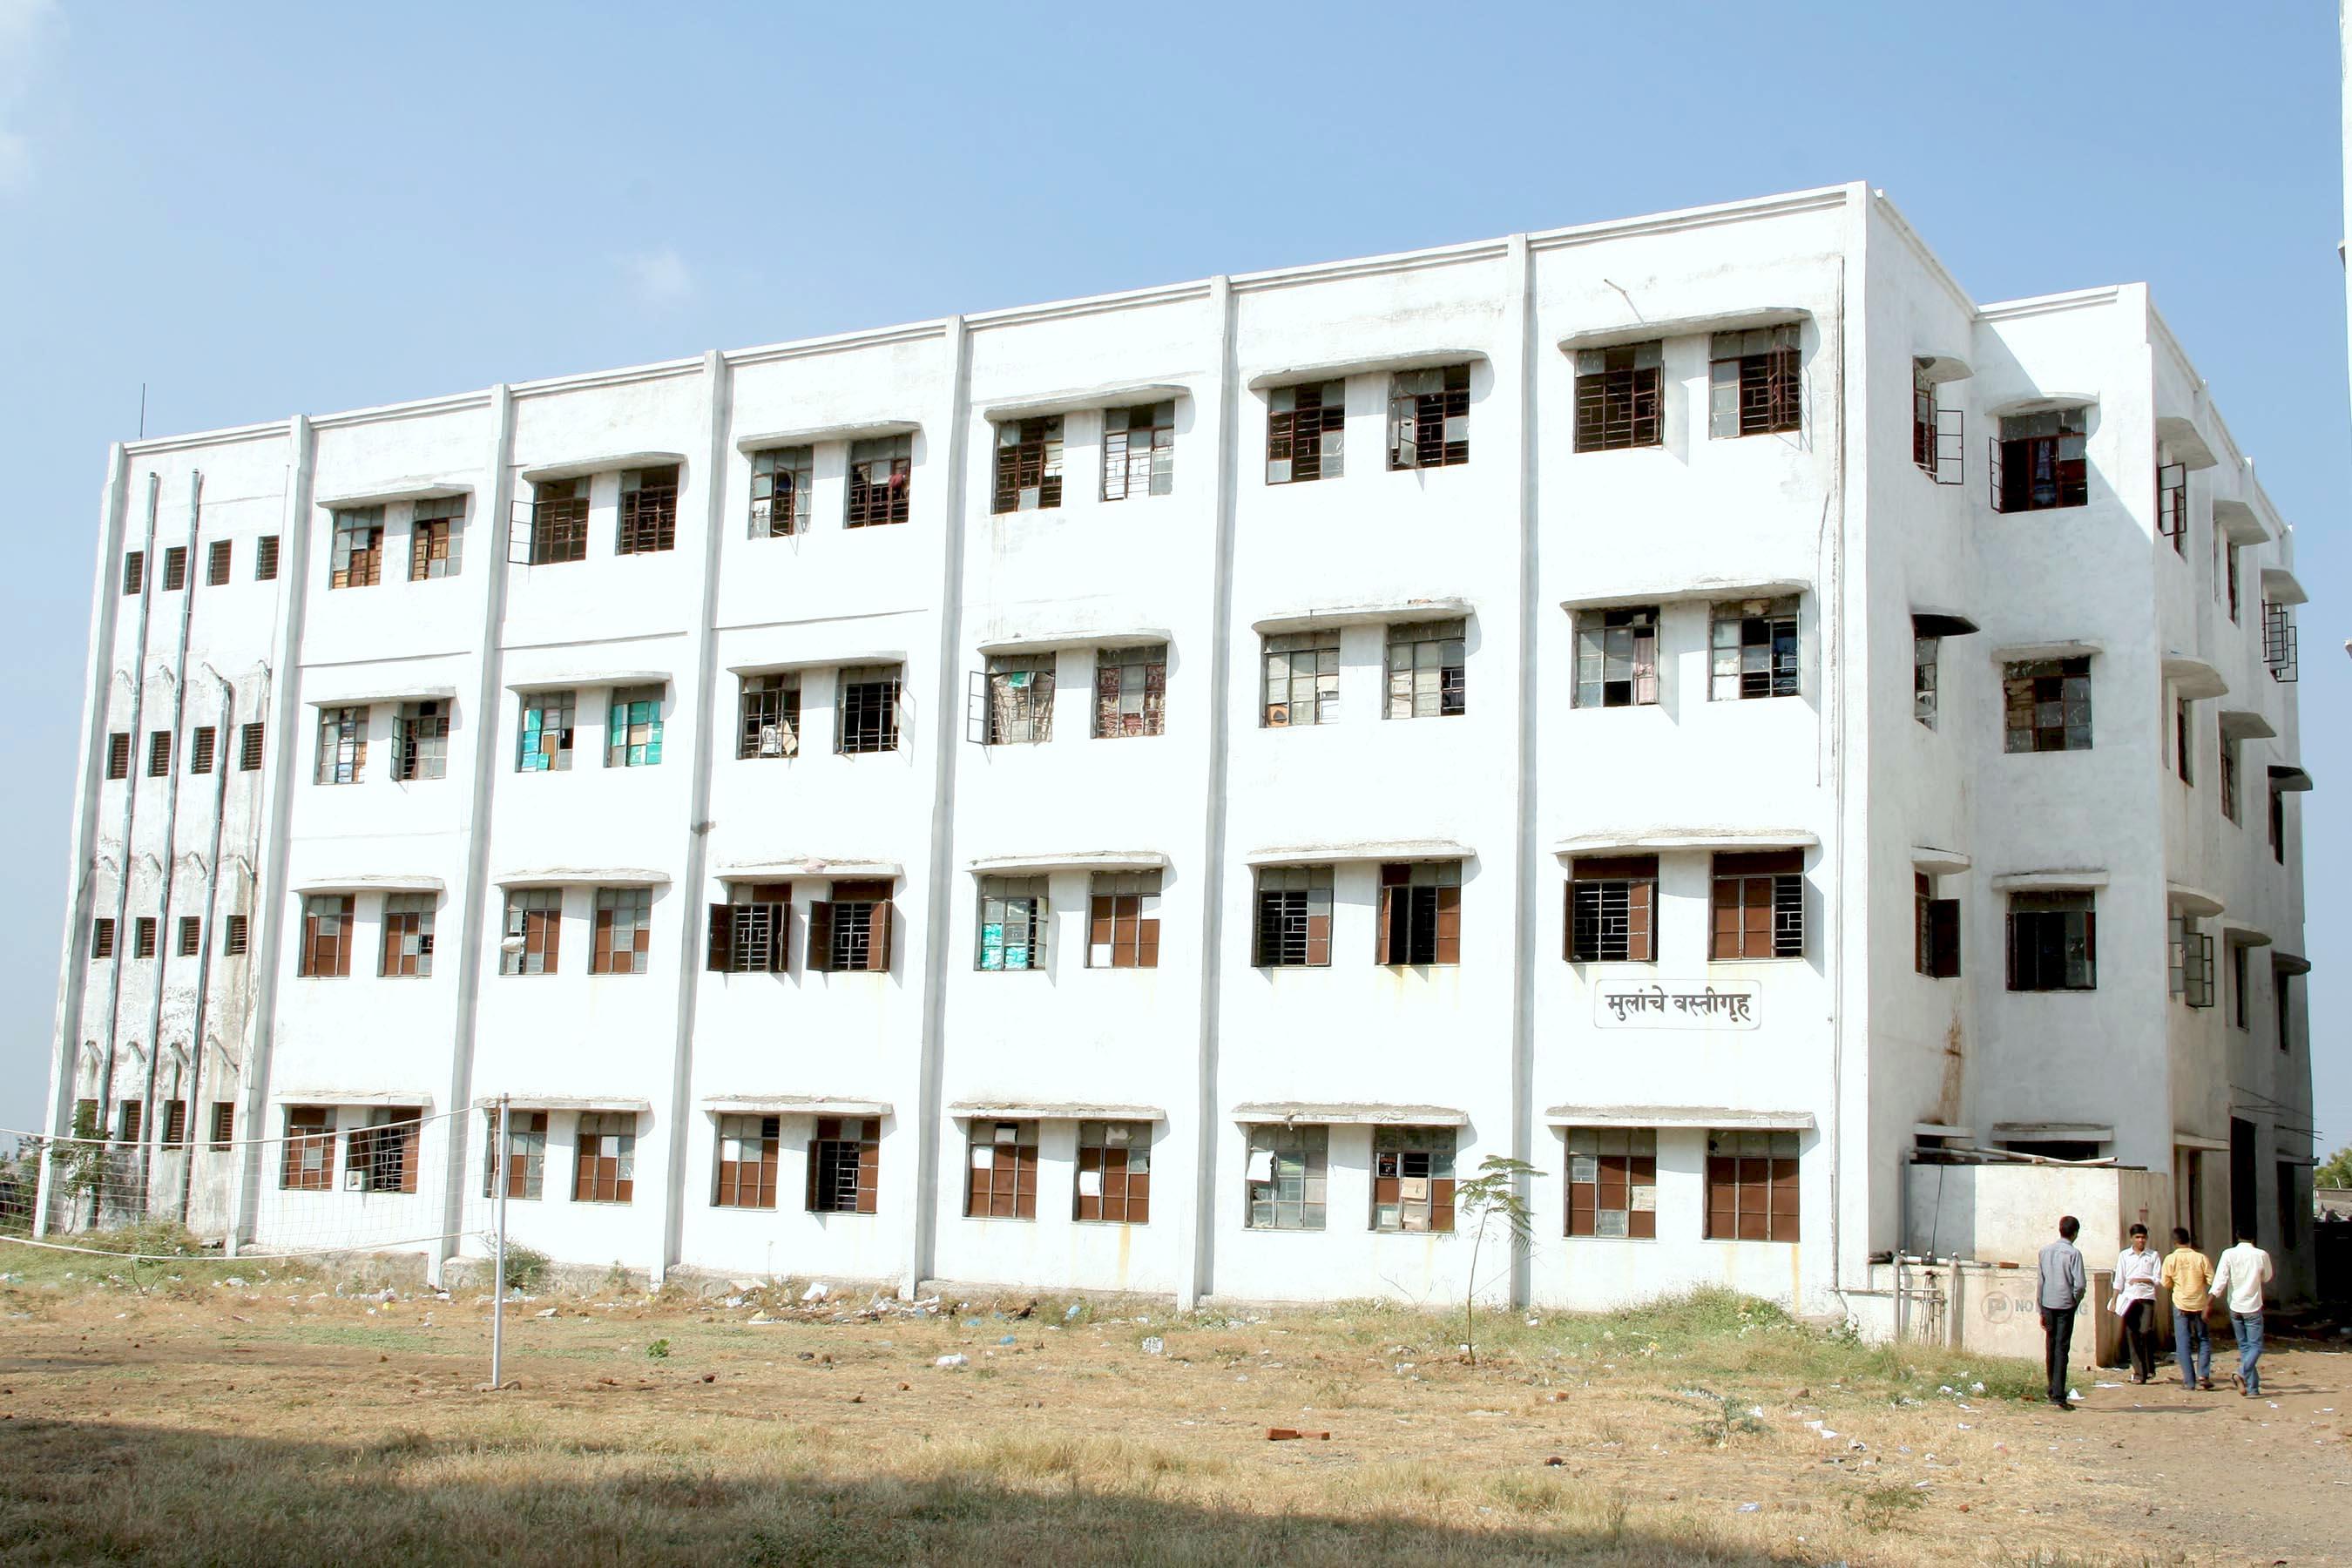 Aditya Engineering College Beed Building